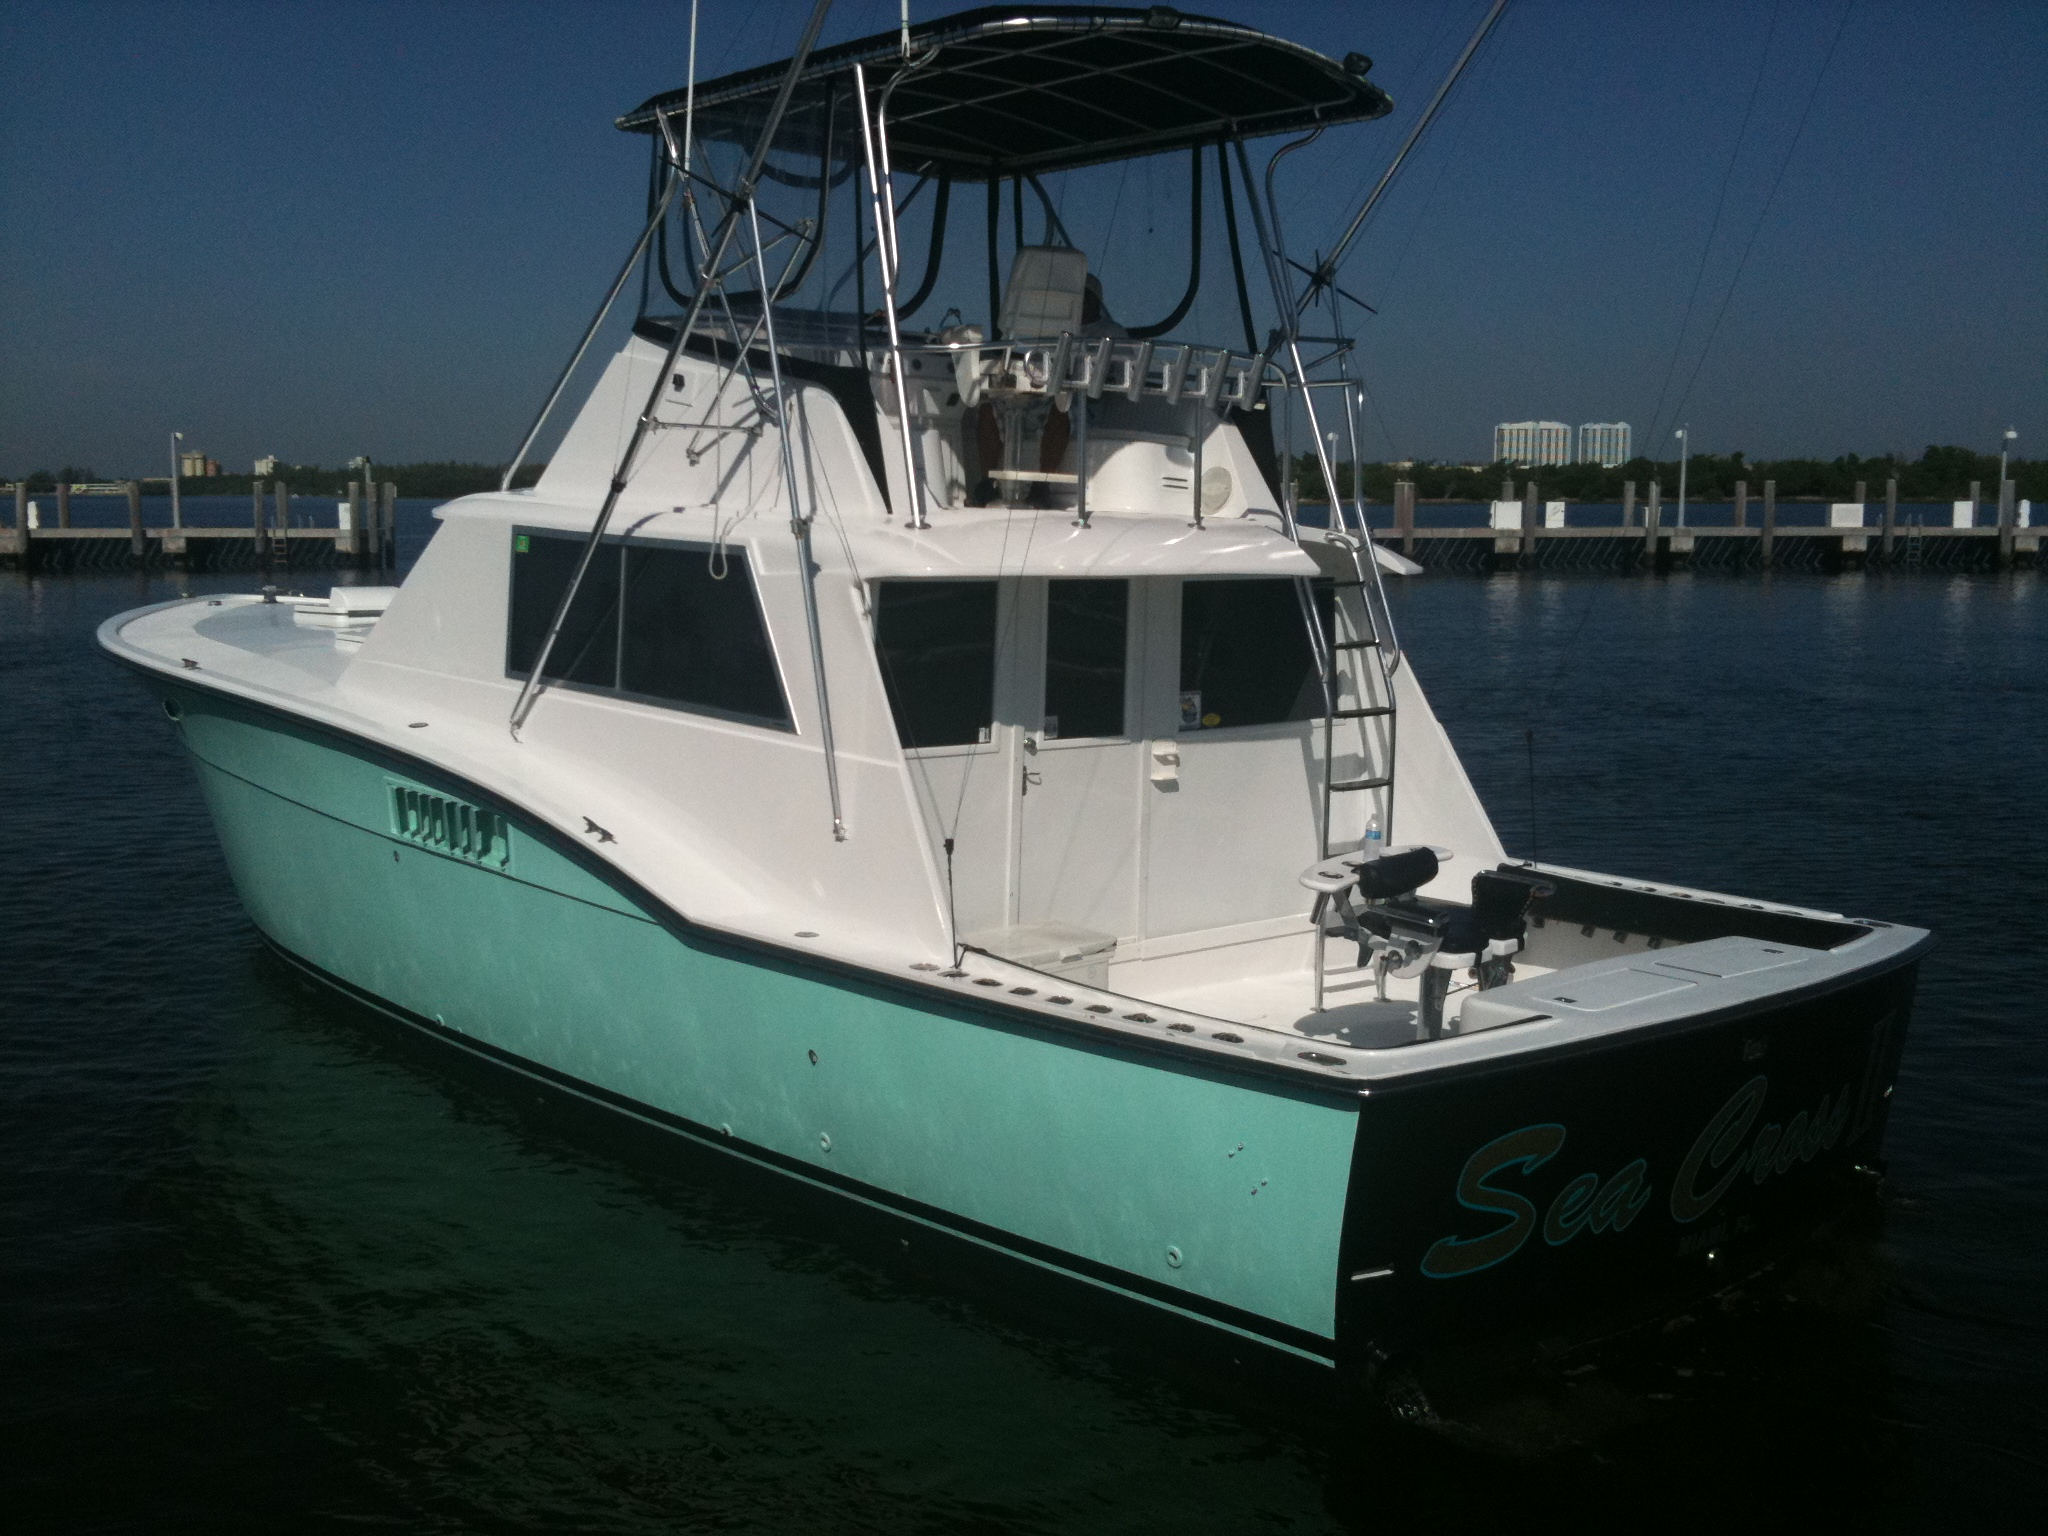 Seacross miami deep sea fishing charters coupons near me for Fishing charters near me